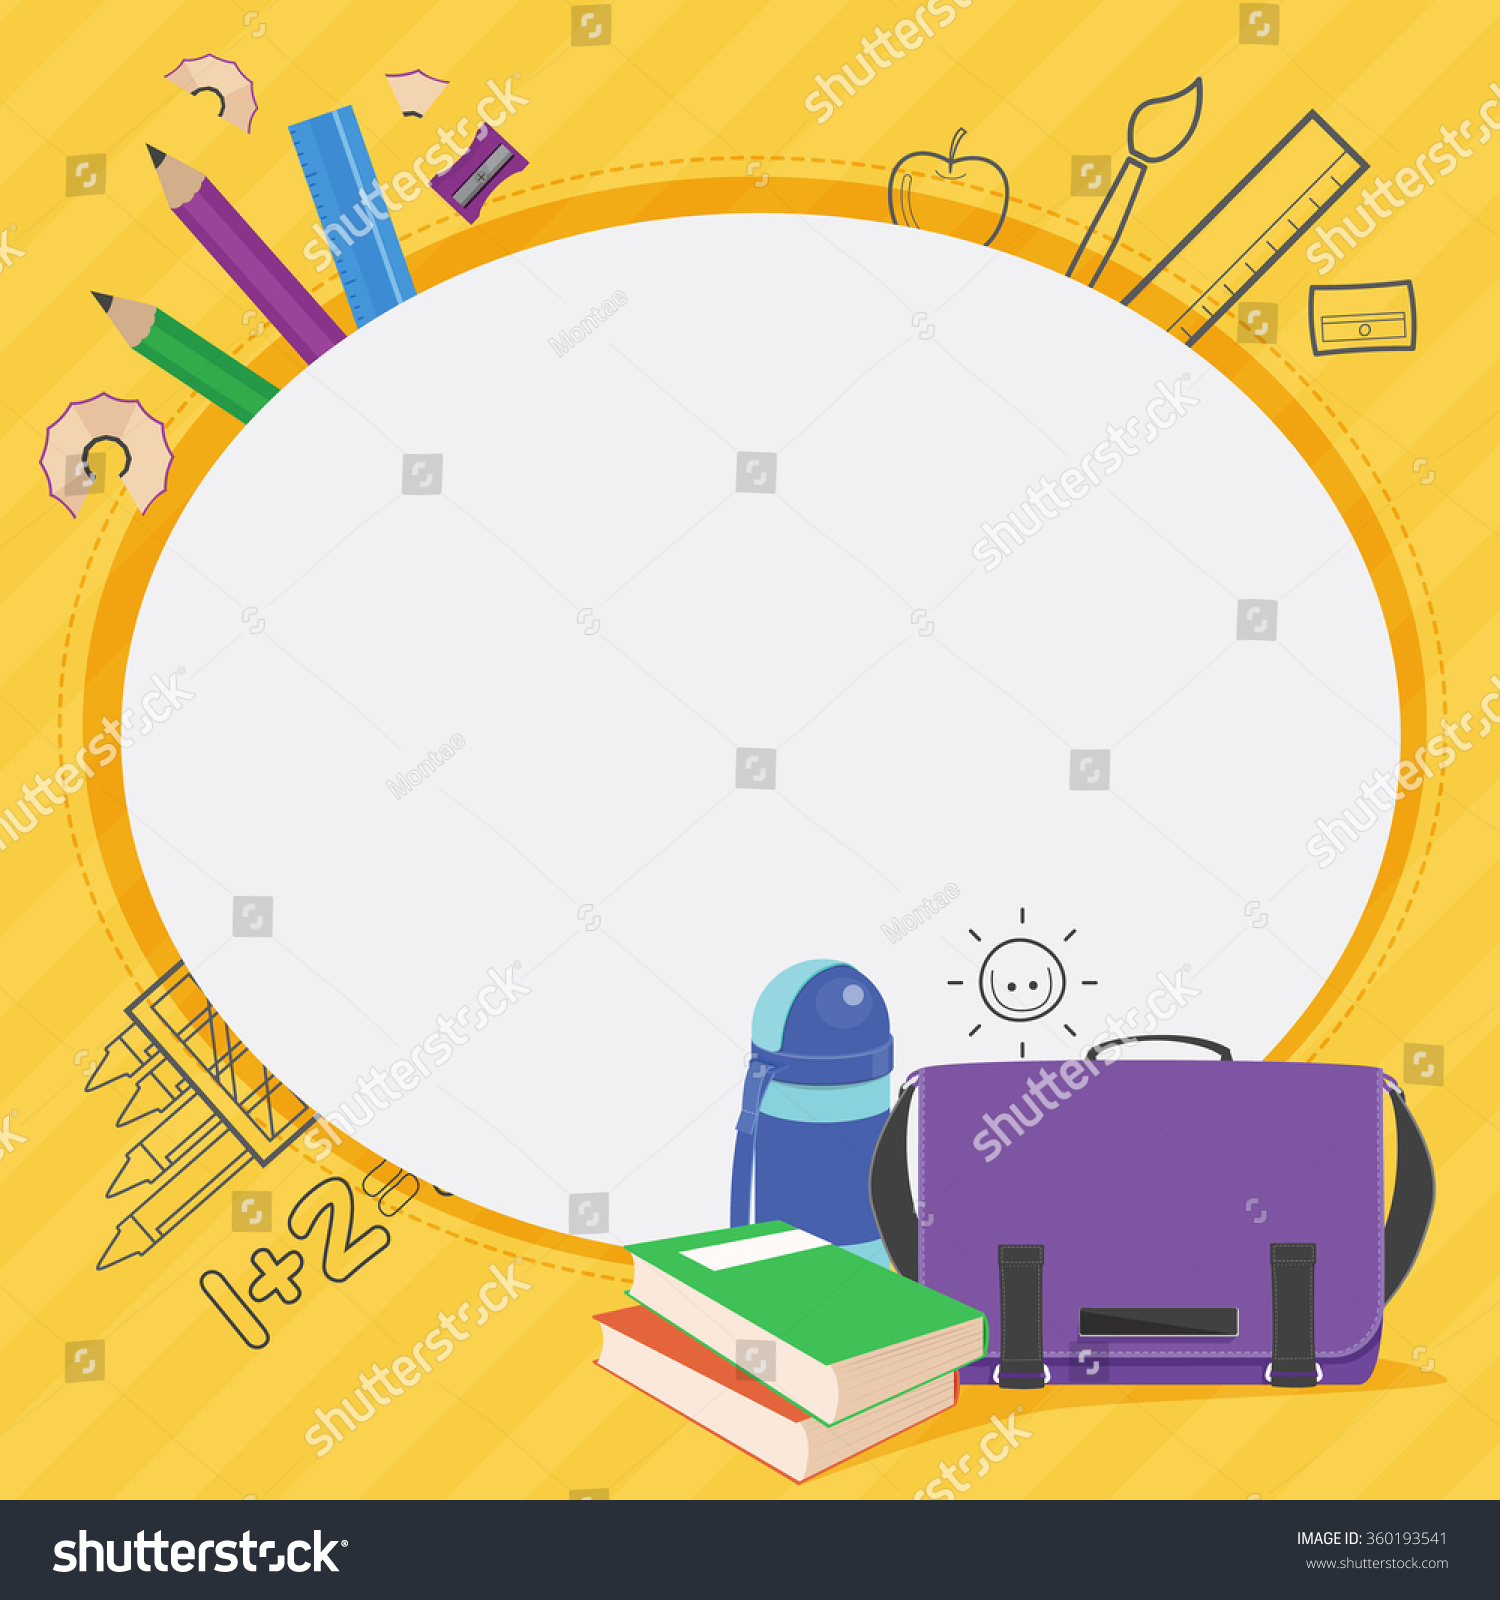 School bag diagram - Vector School Kid Frame Design School Bag Place For Text